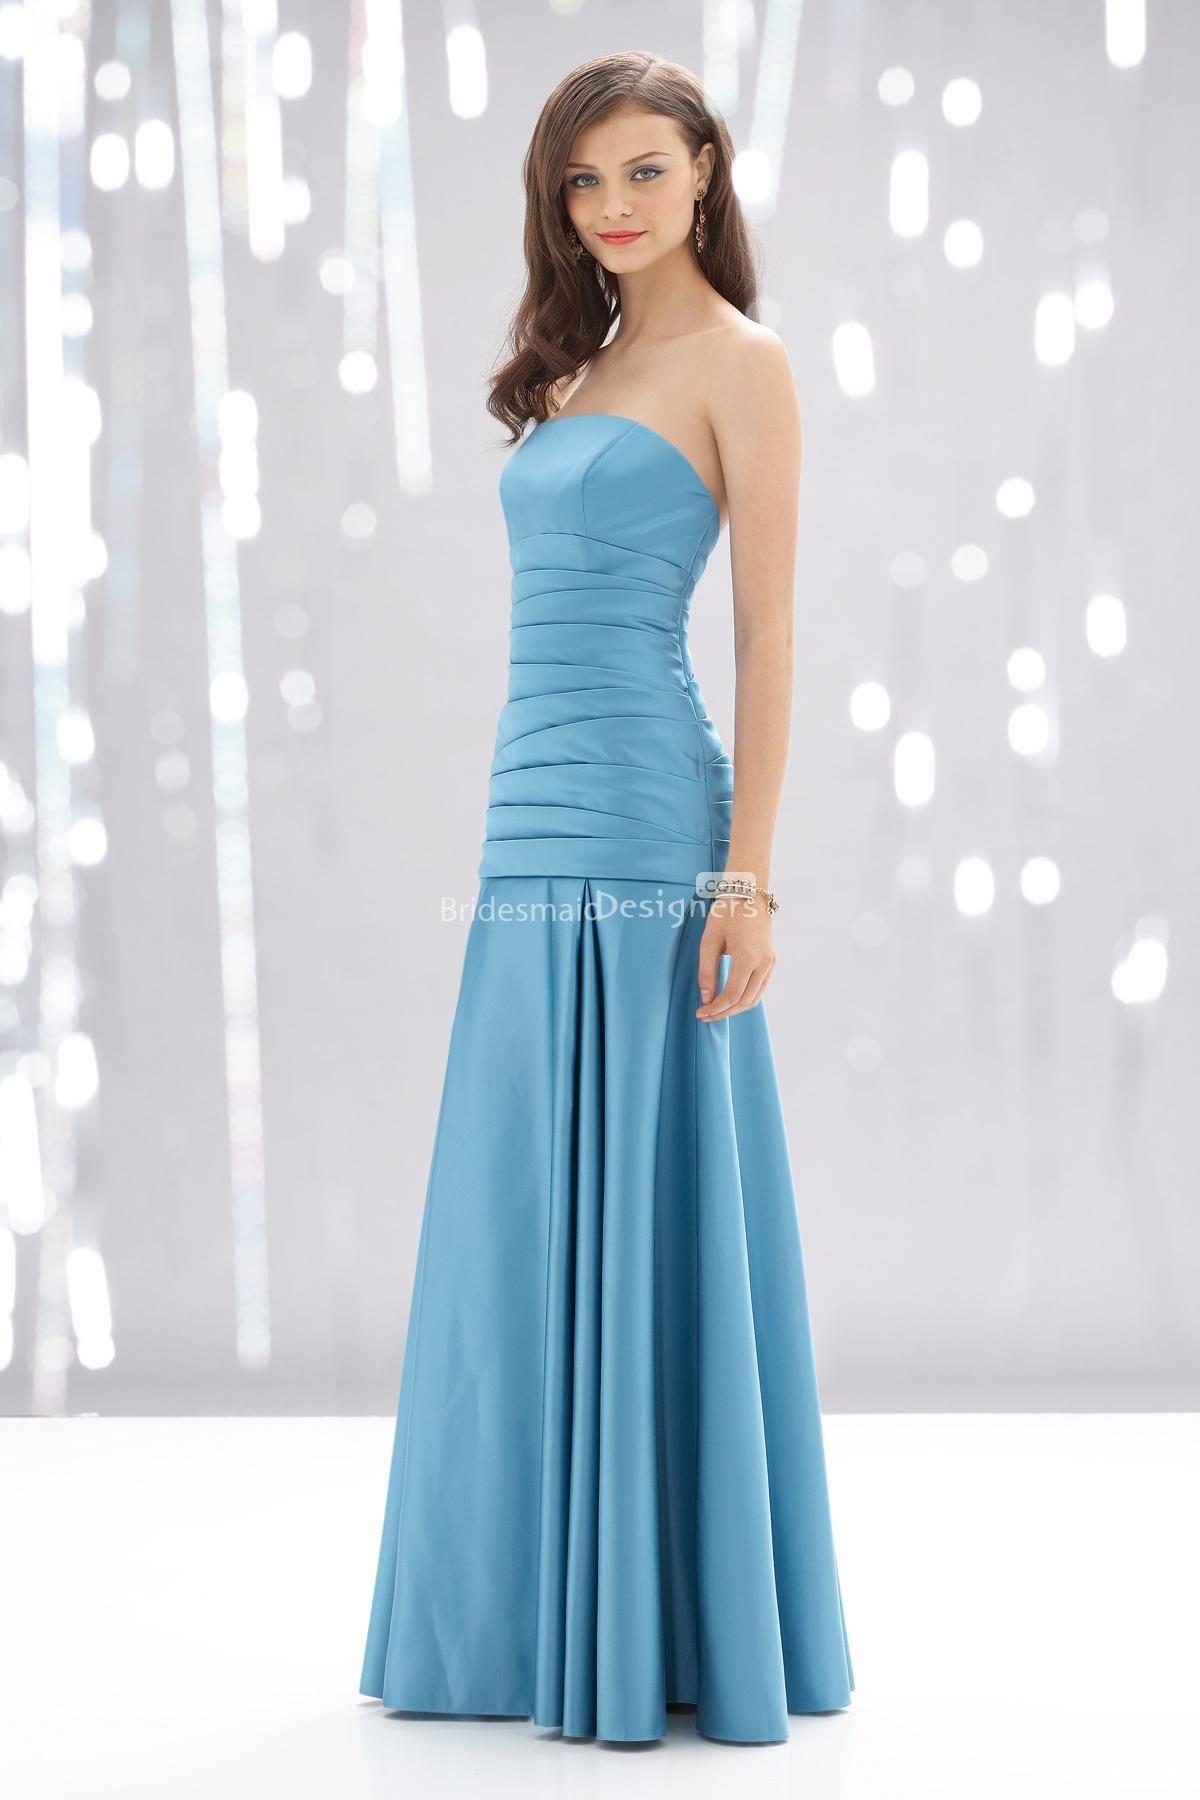 Modest blue duchess satin strapless long bridesmaid dress with ...